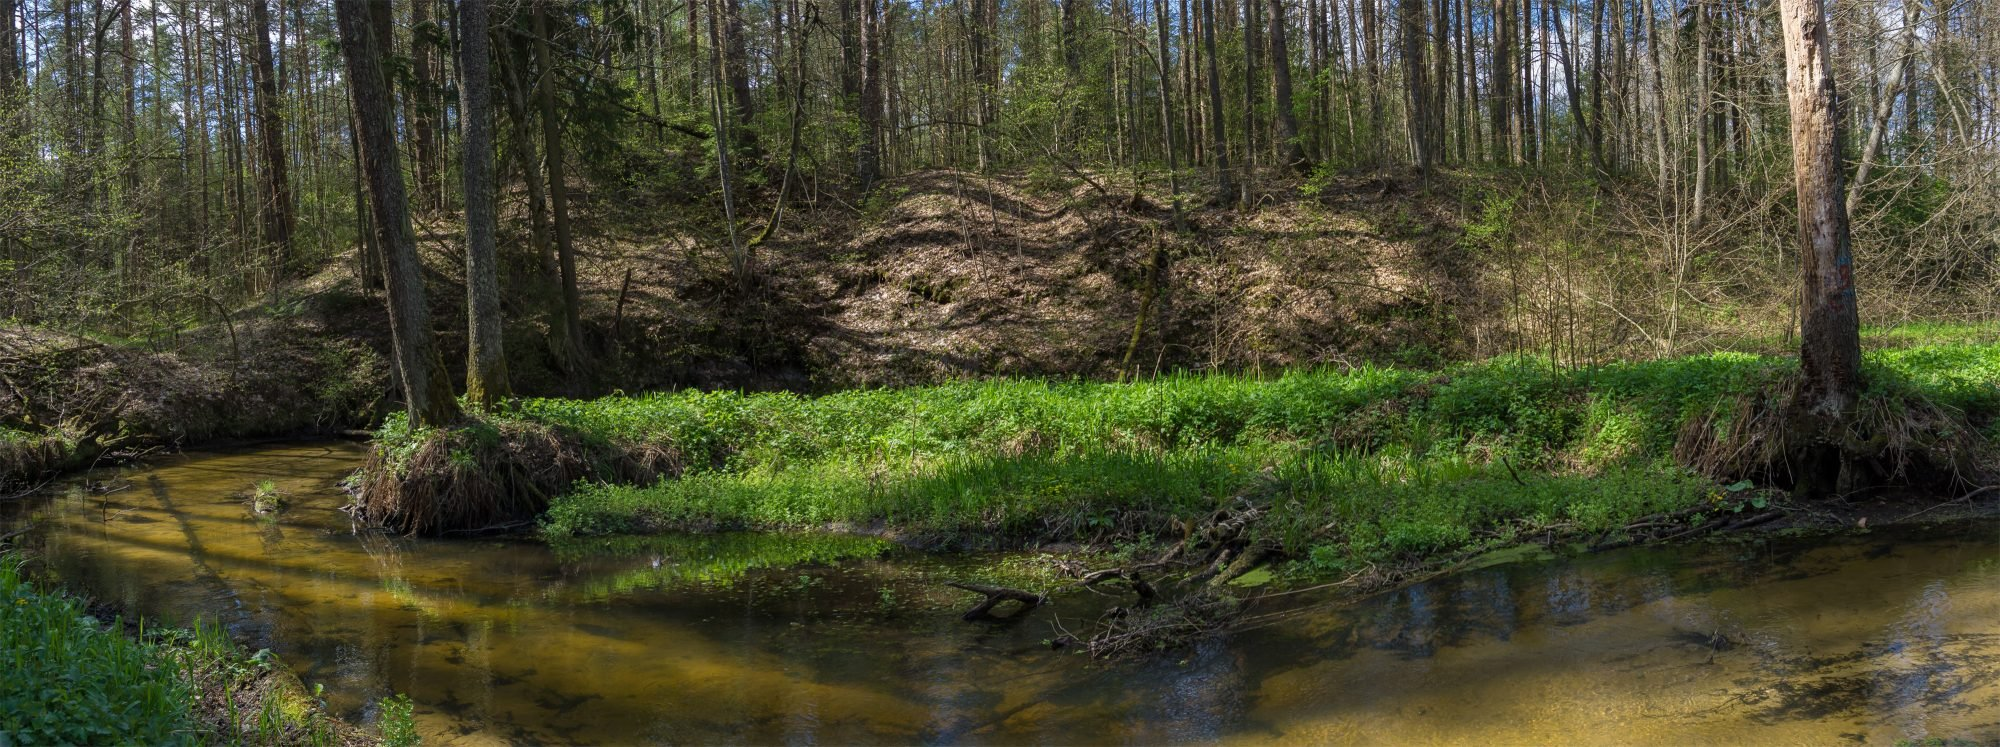 Балтский курган на берегу речки